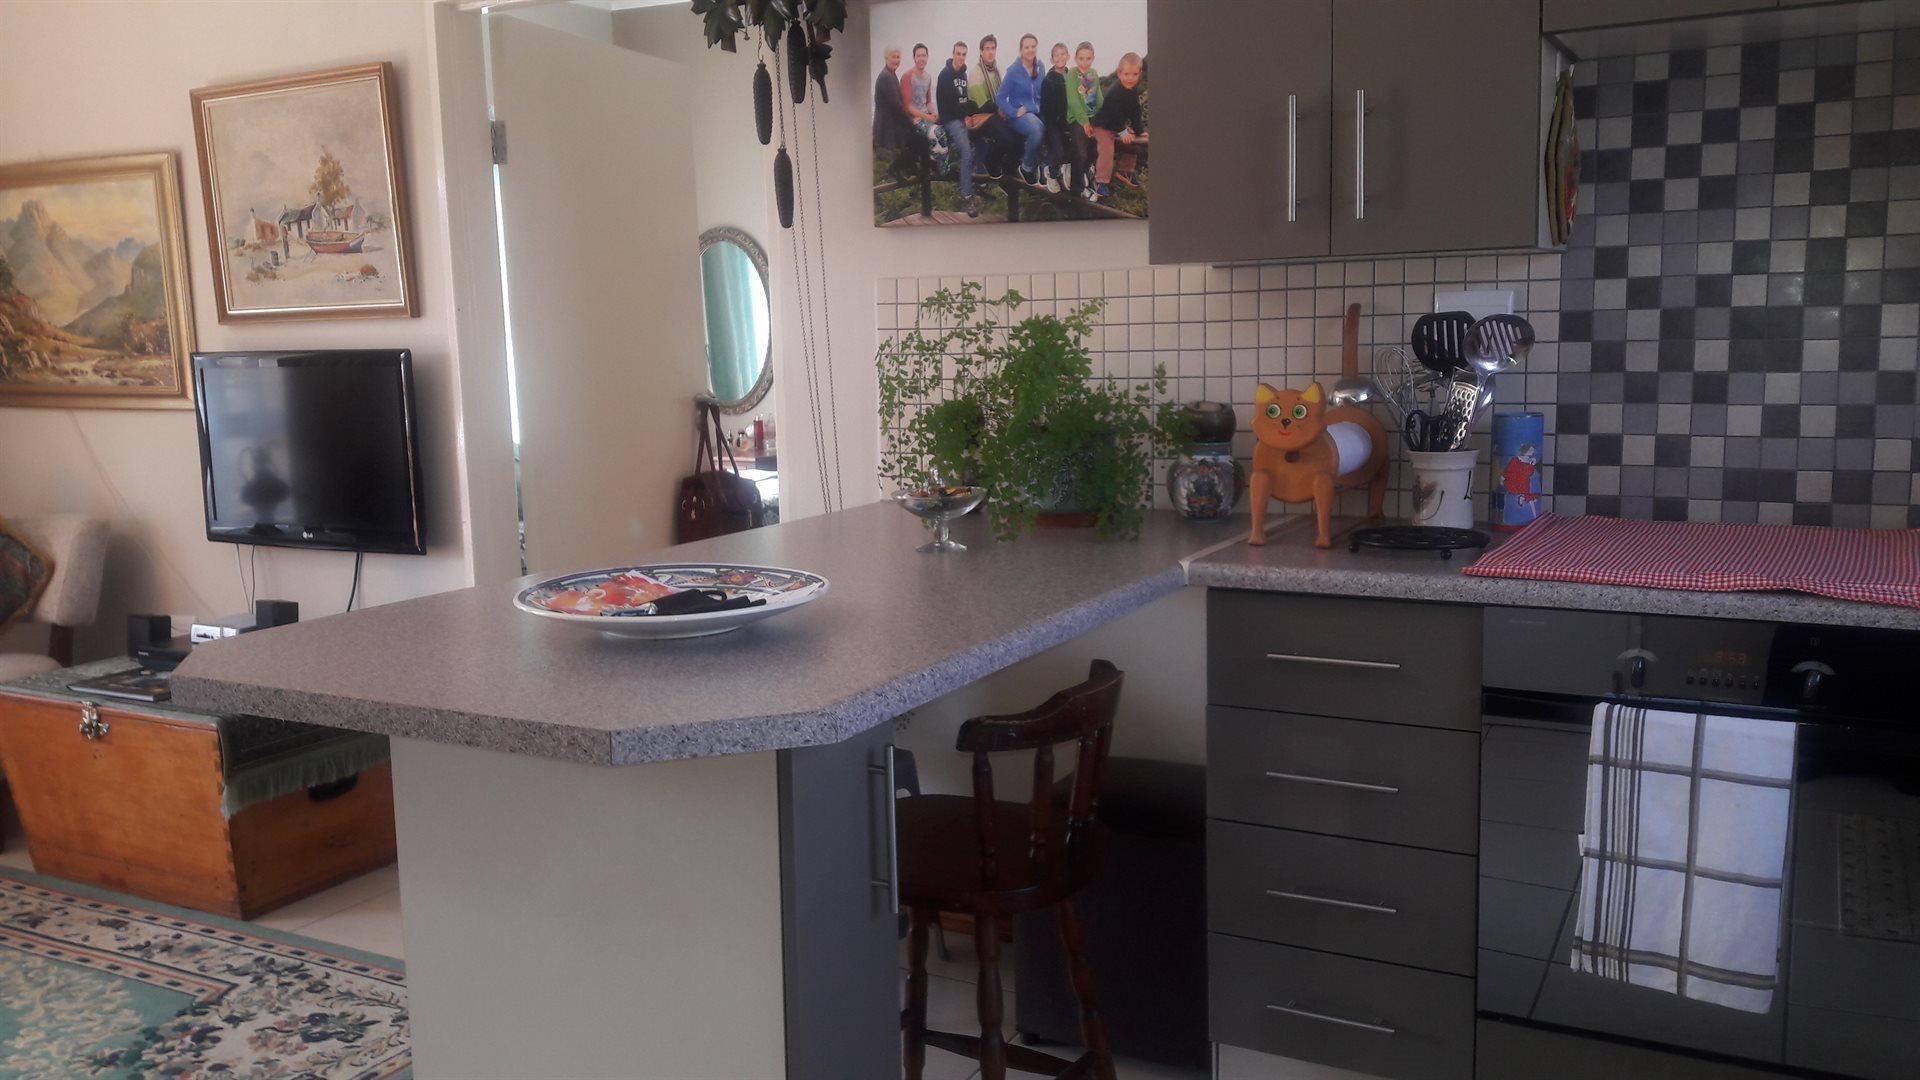 Veld En Vlei property for sale. Ref No: 13504973. Picture no 6